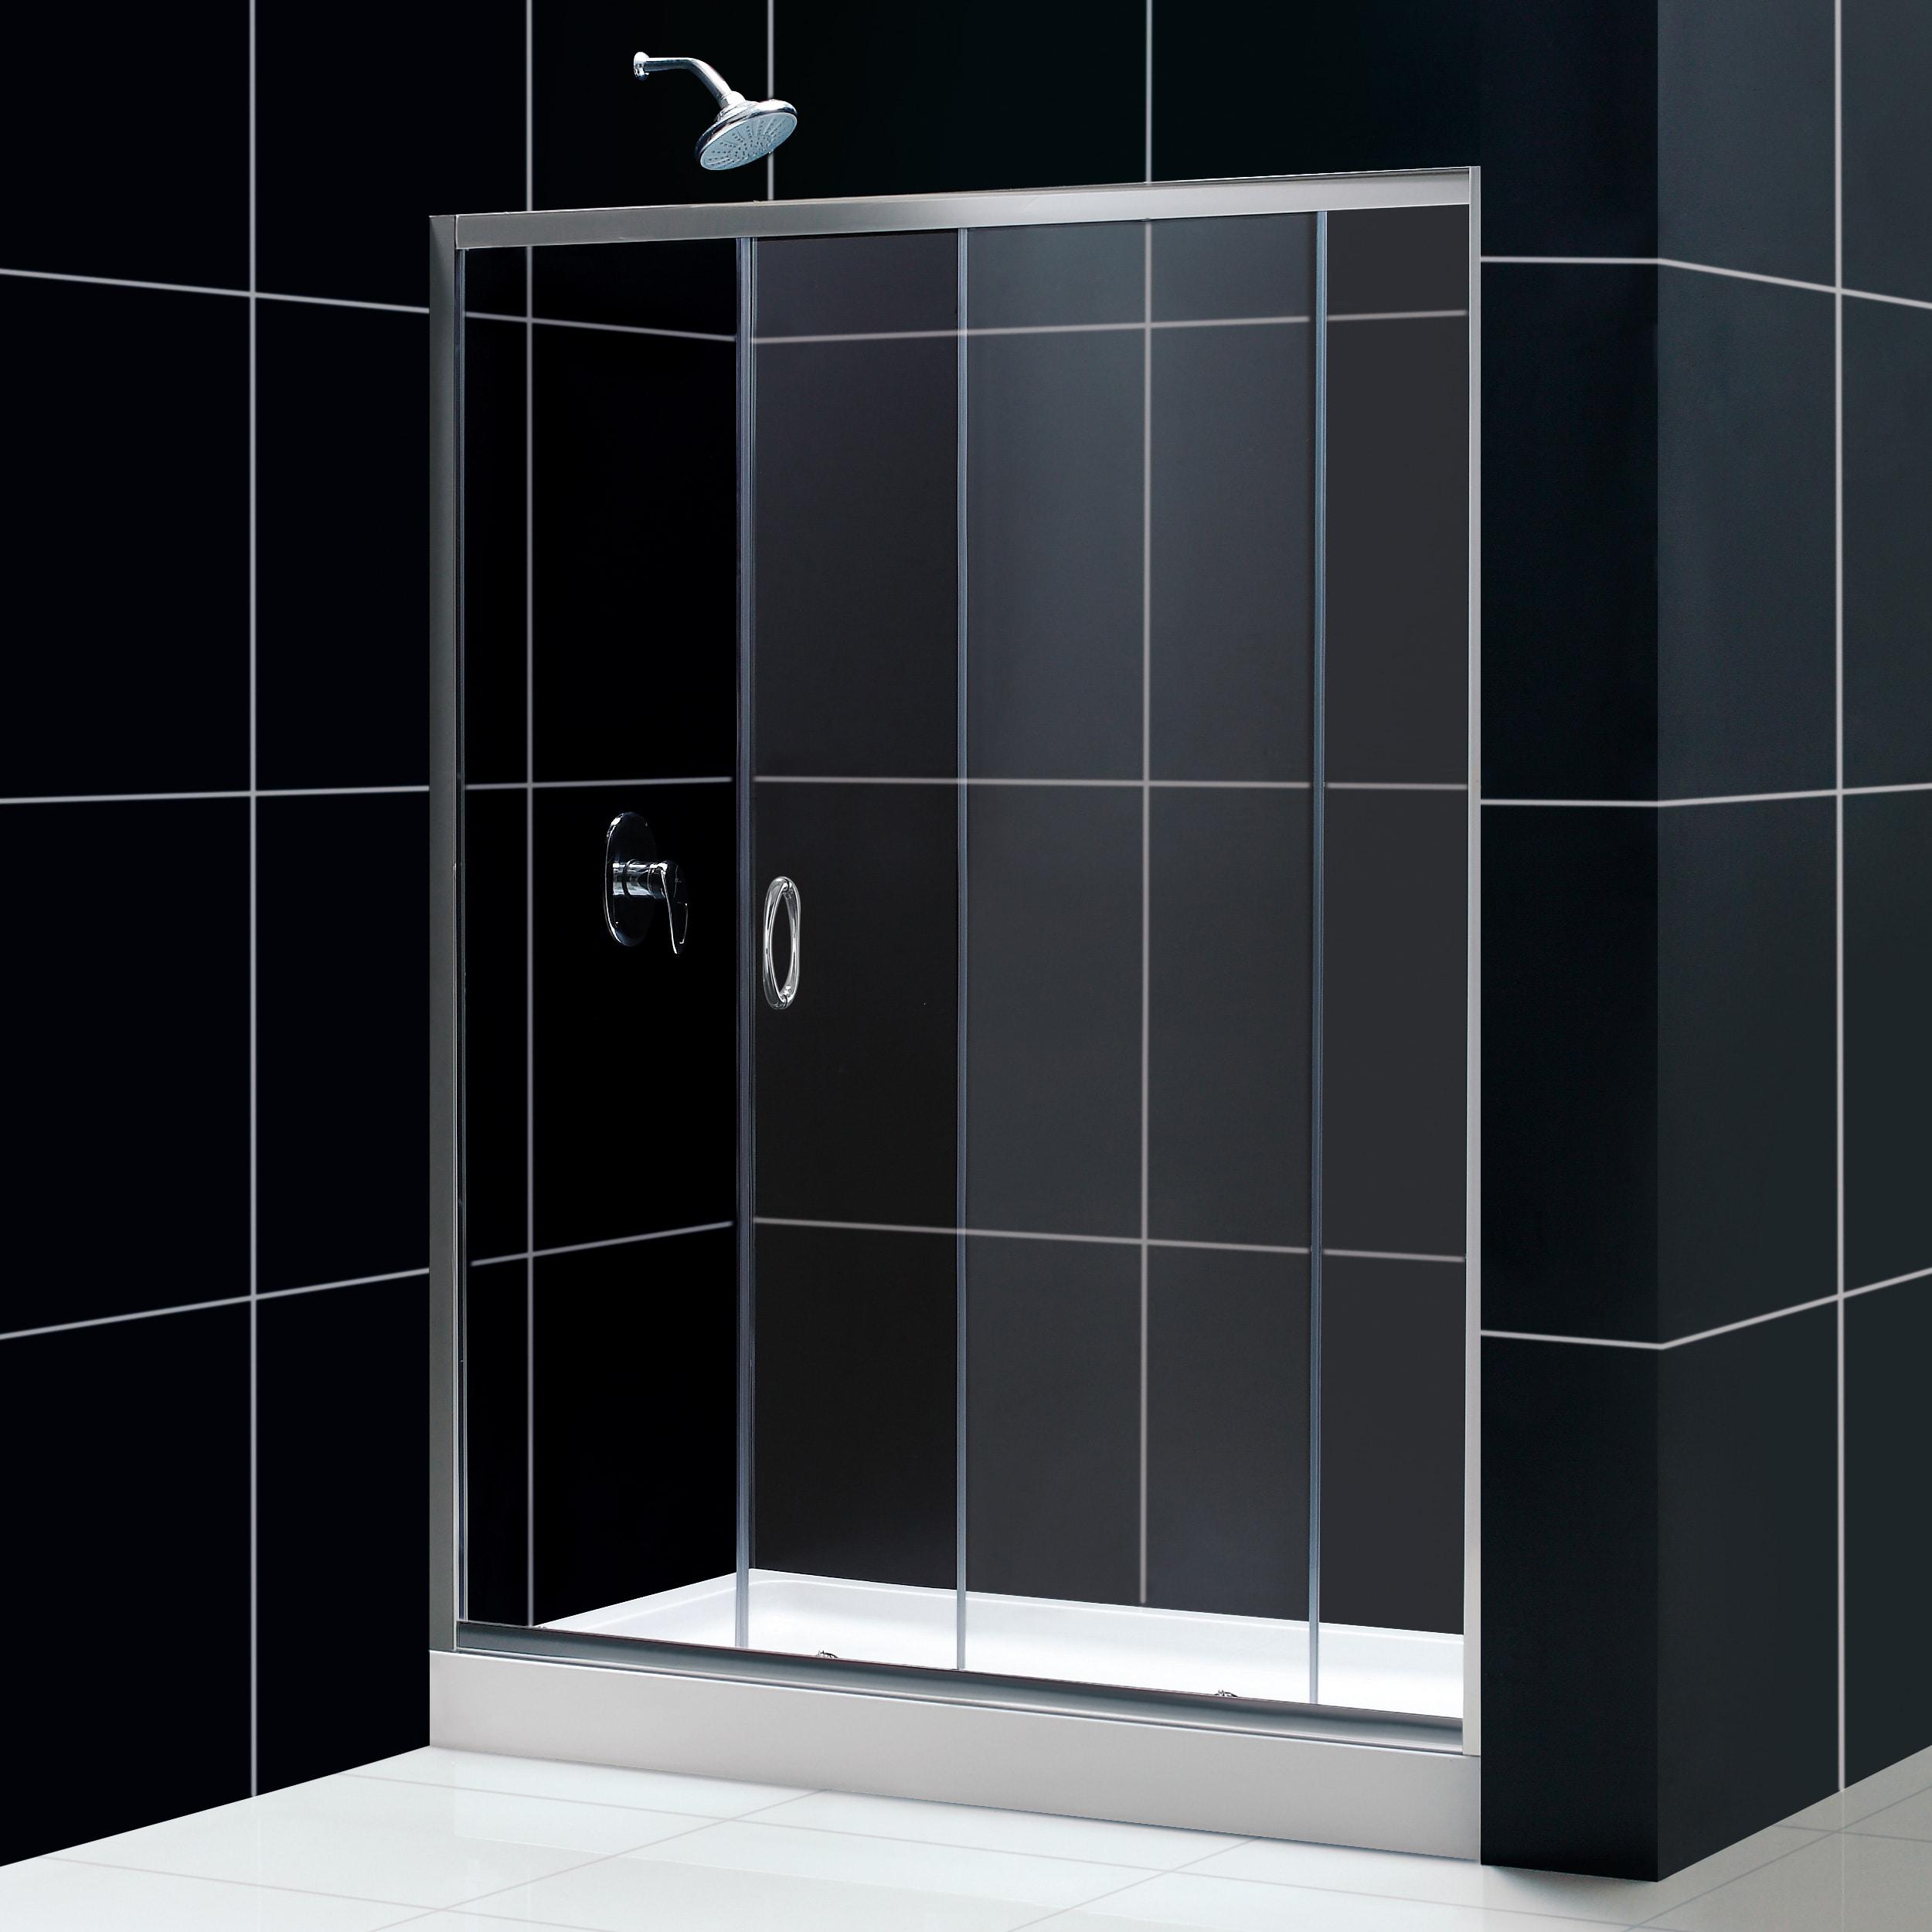 DreamLine Infinity 60x72-inch Shower Door and Amazon Base